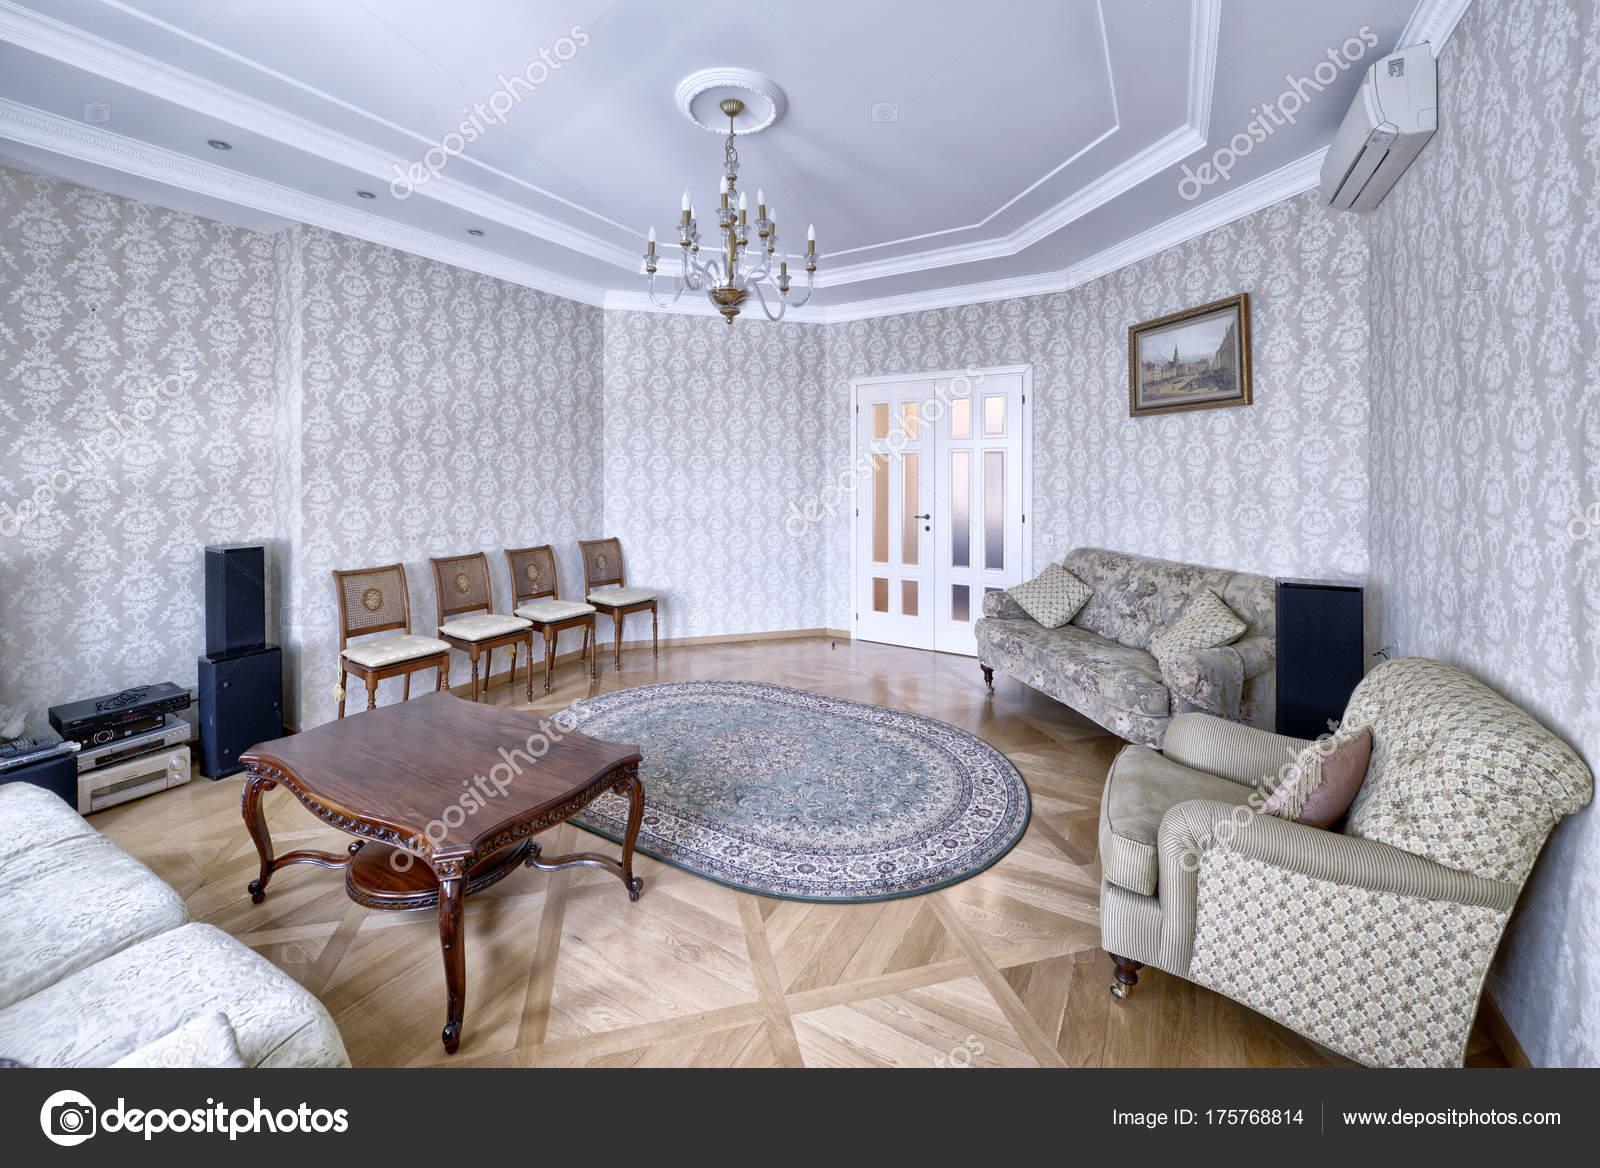 Modern Interieur Woonkamer : Rusland moskou modern interieur woonkamer stedelijk vastgoed